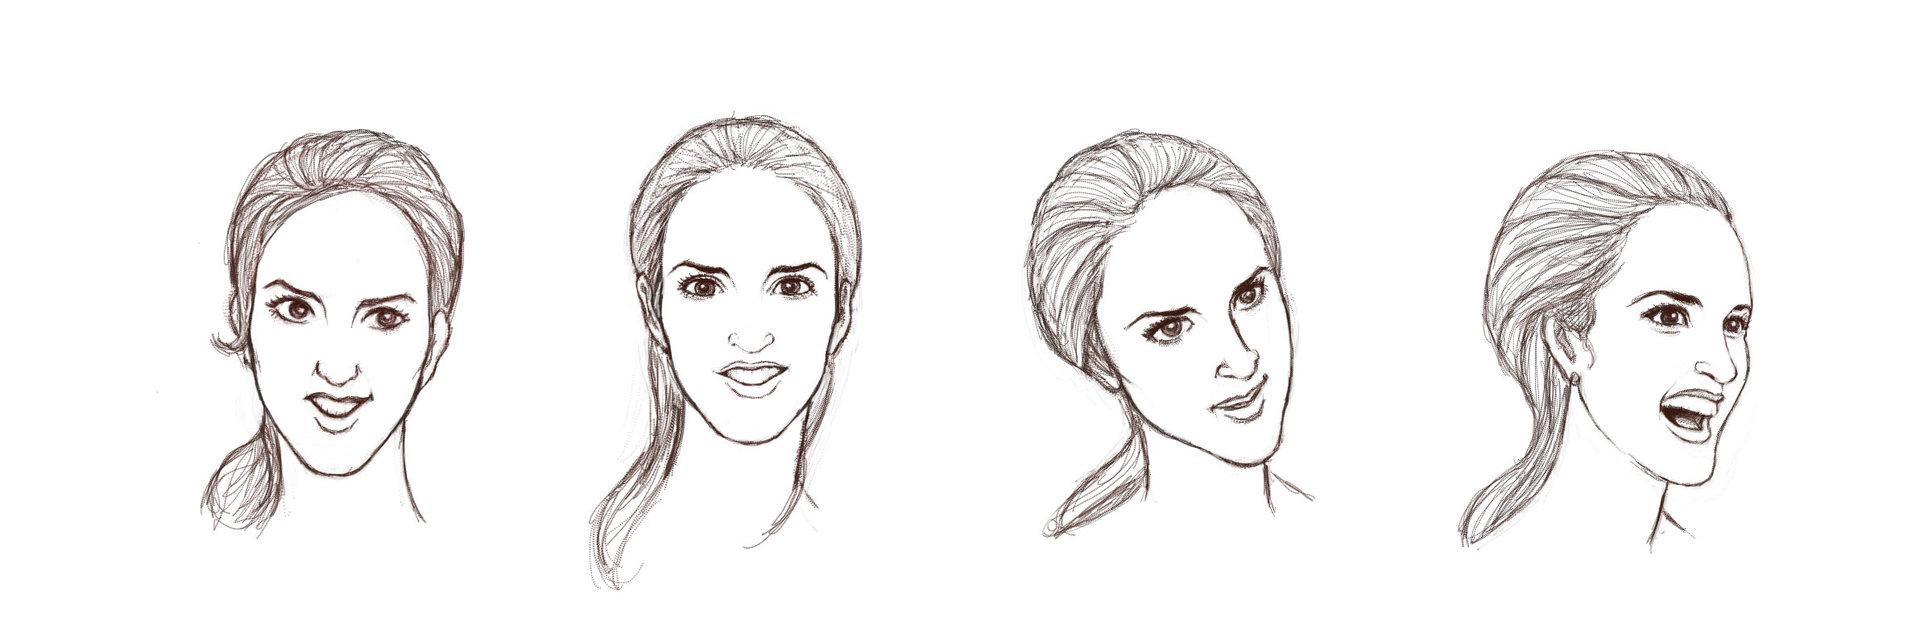 Patricia vasquez de velasco kinamita rostros 001b